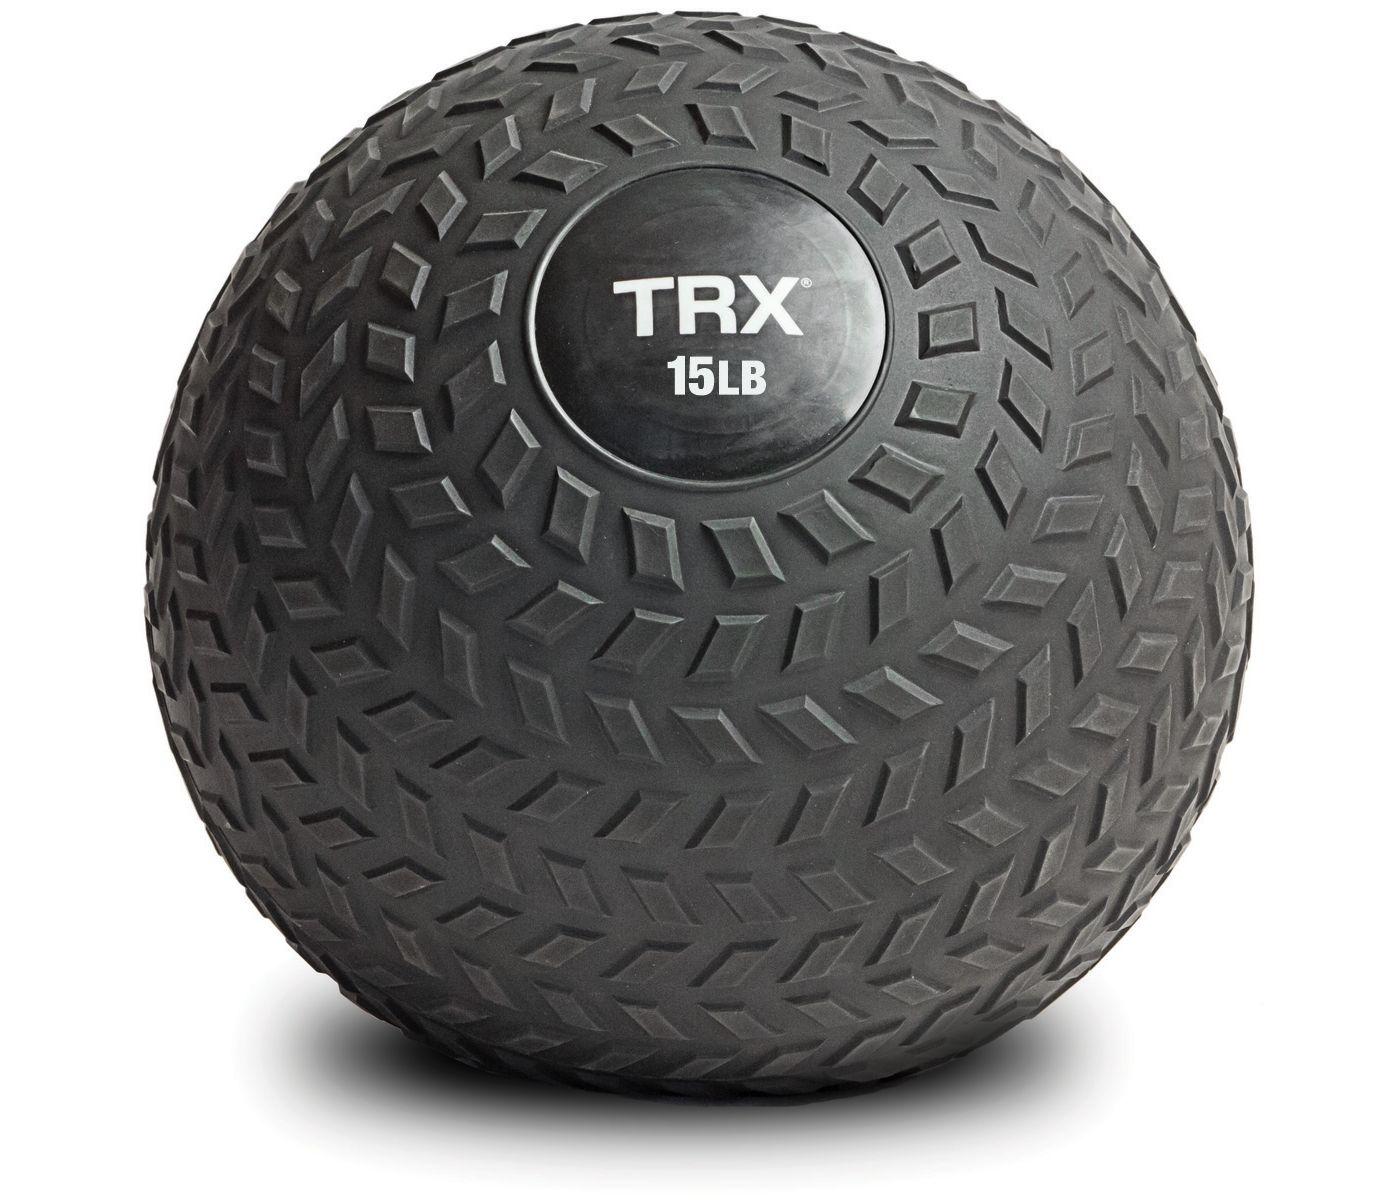 TRX 15 lb. Slam Ball